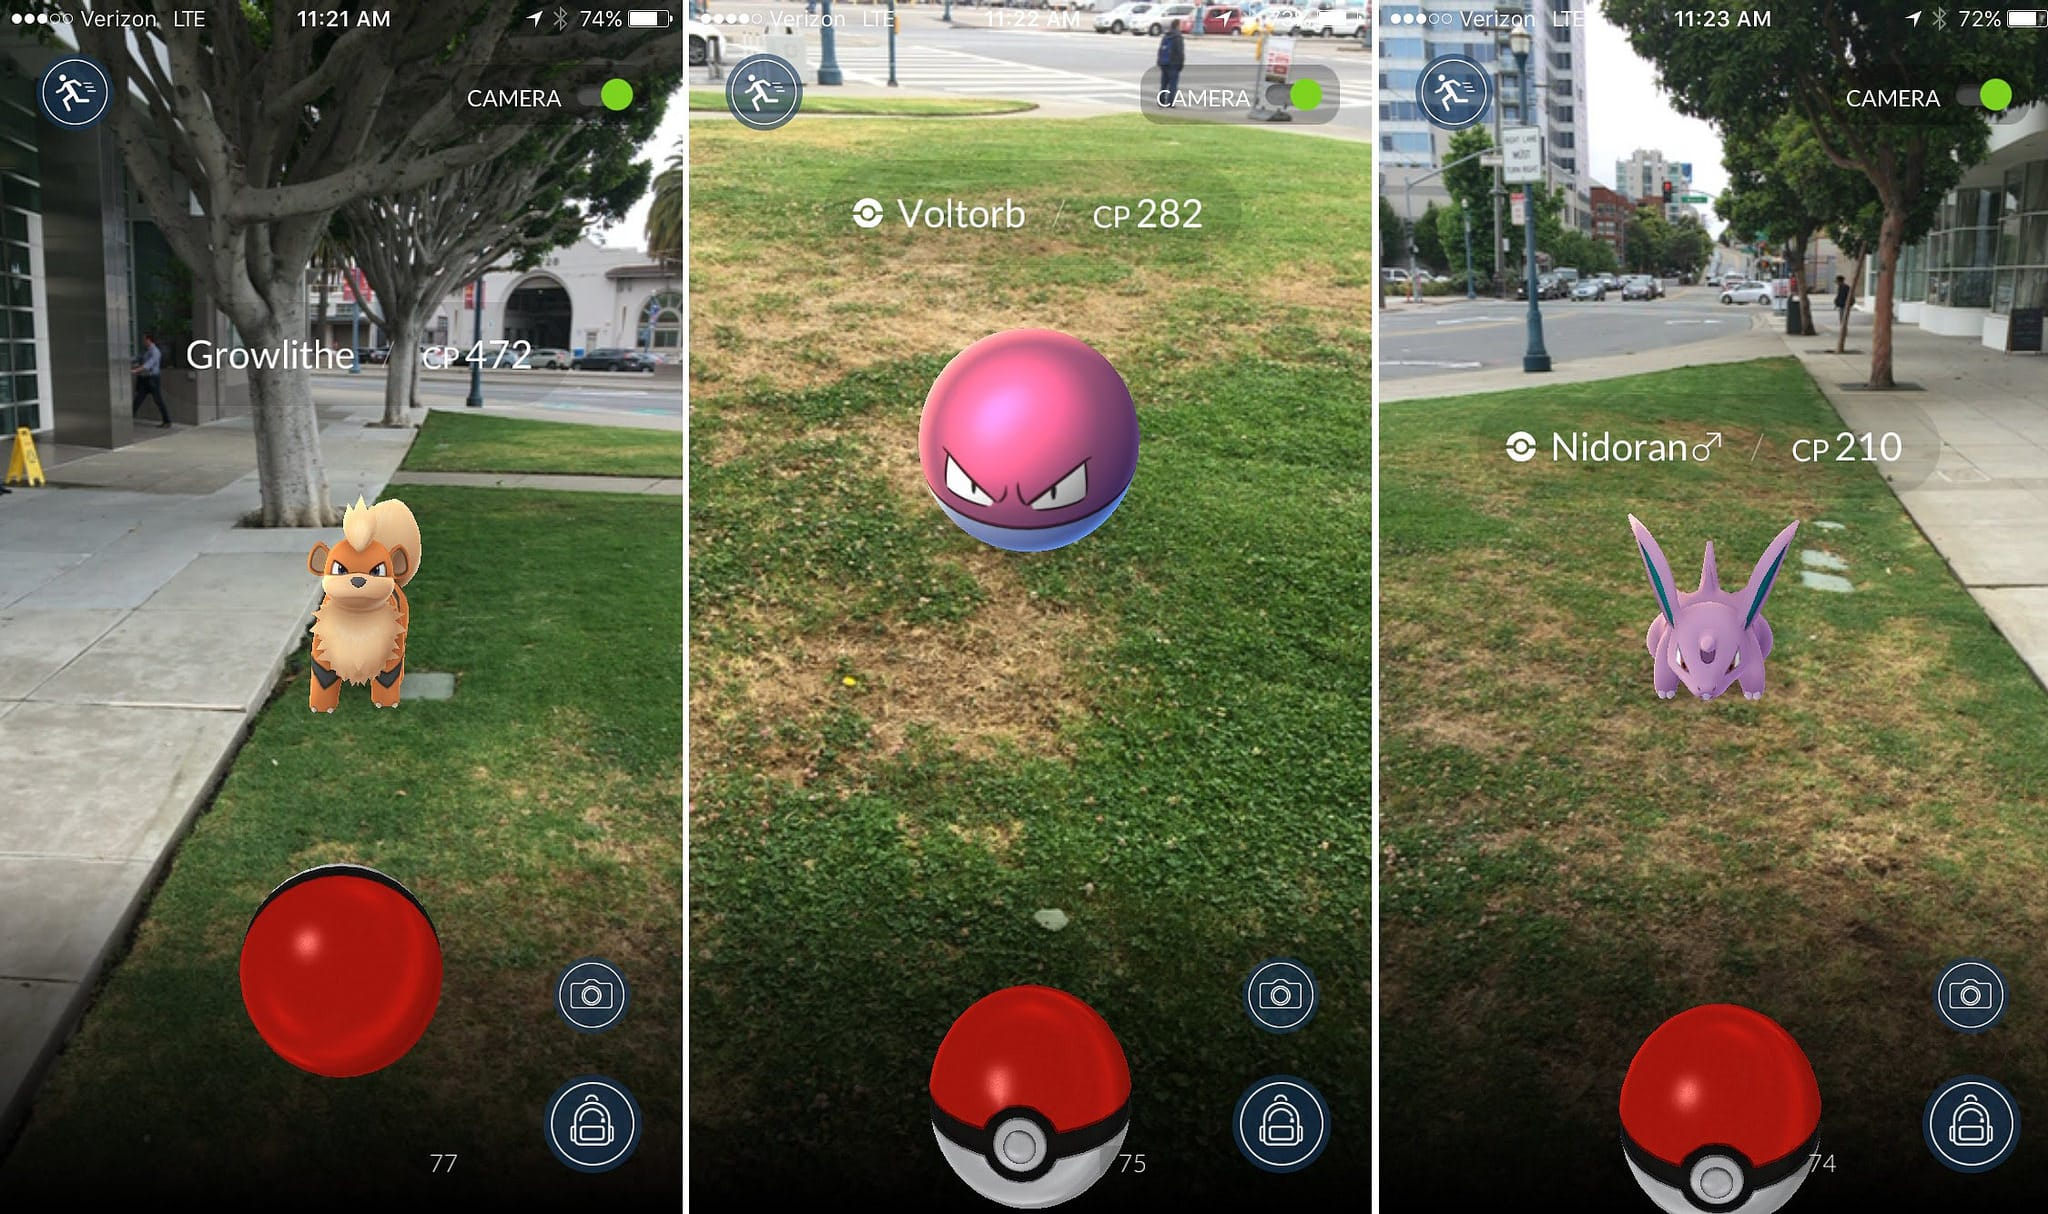 Augmented Reality in Pokémon GO